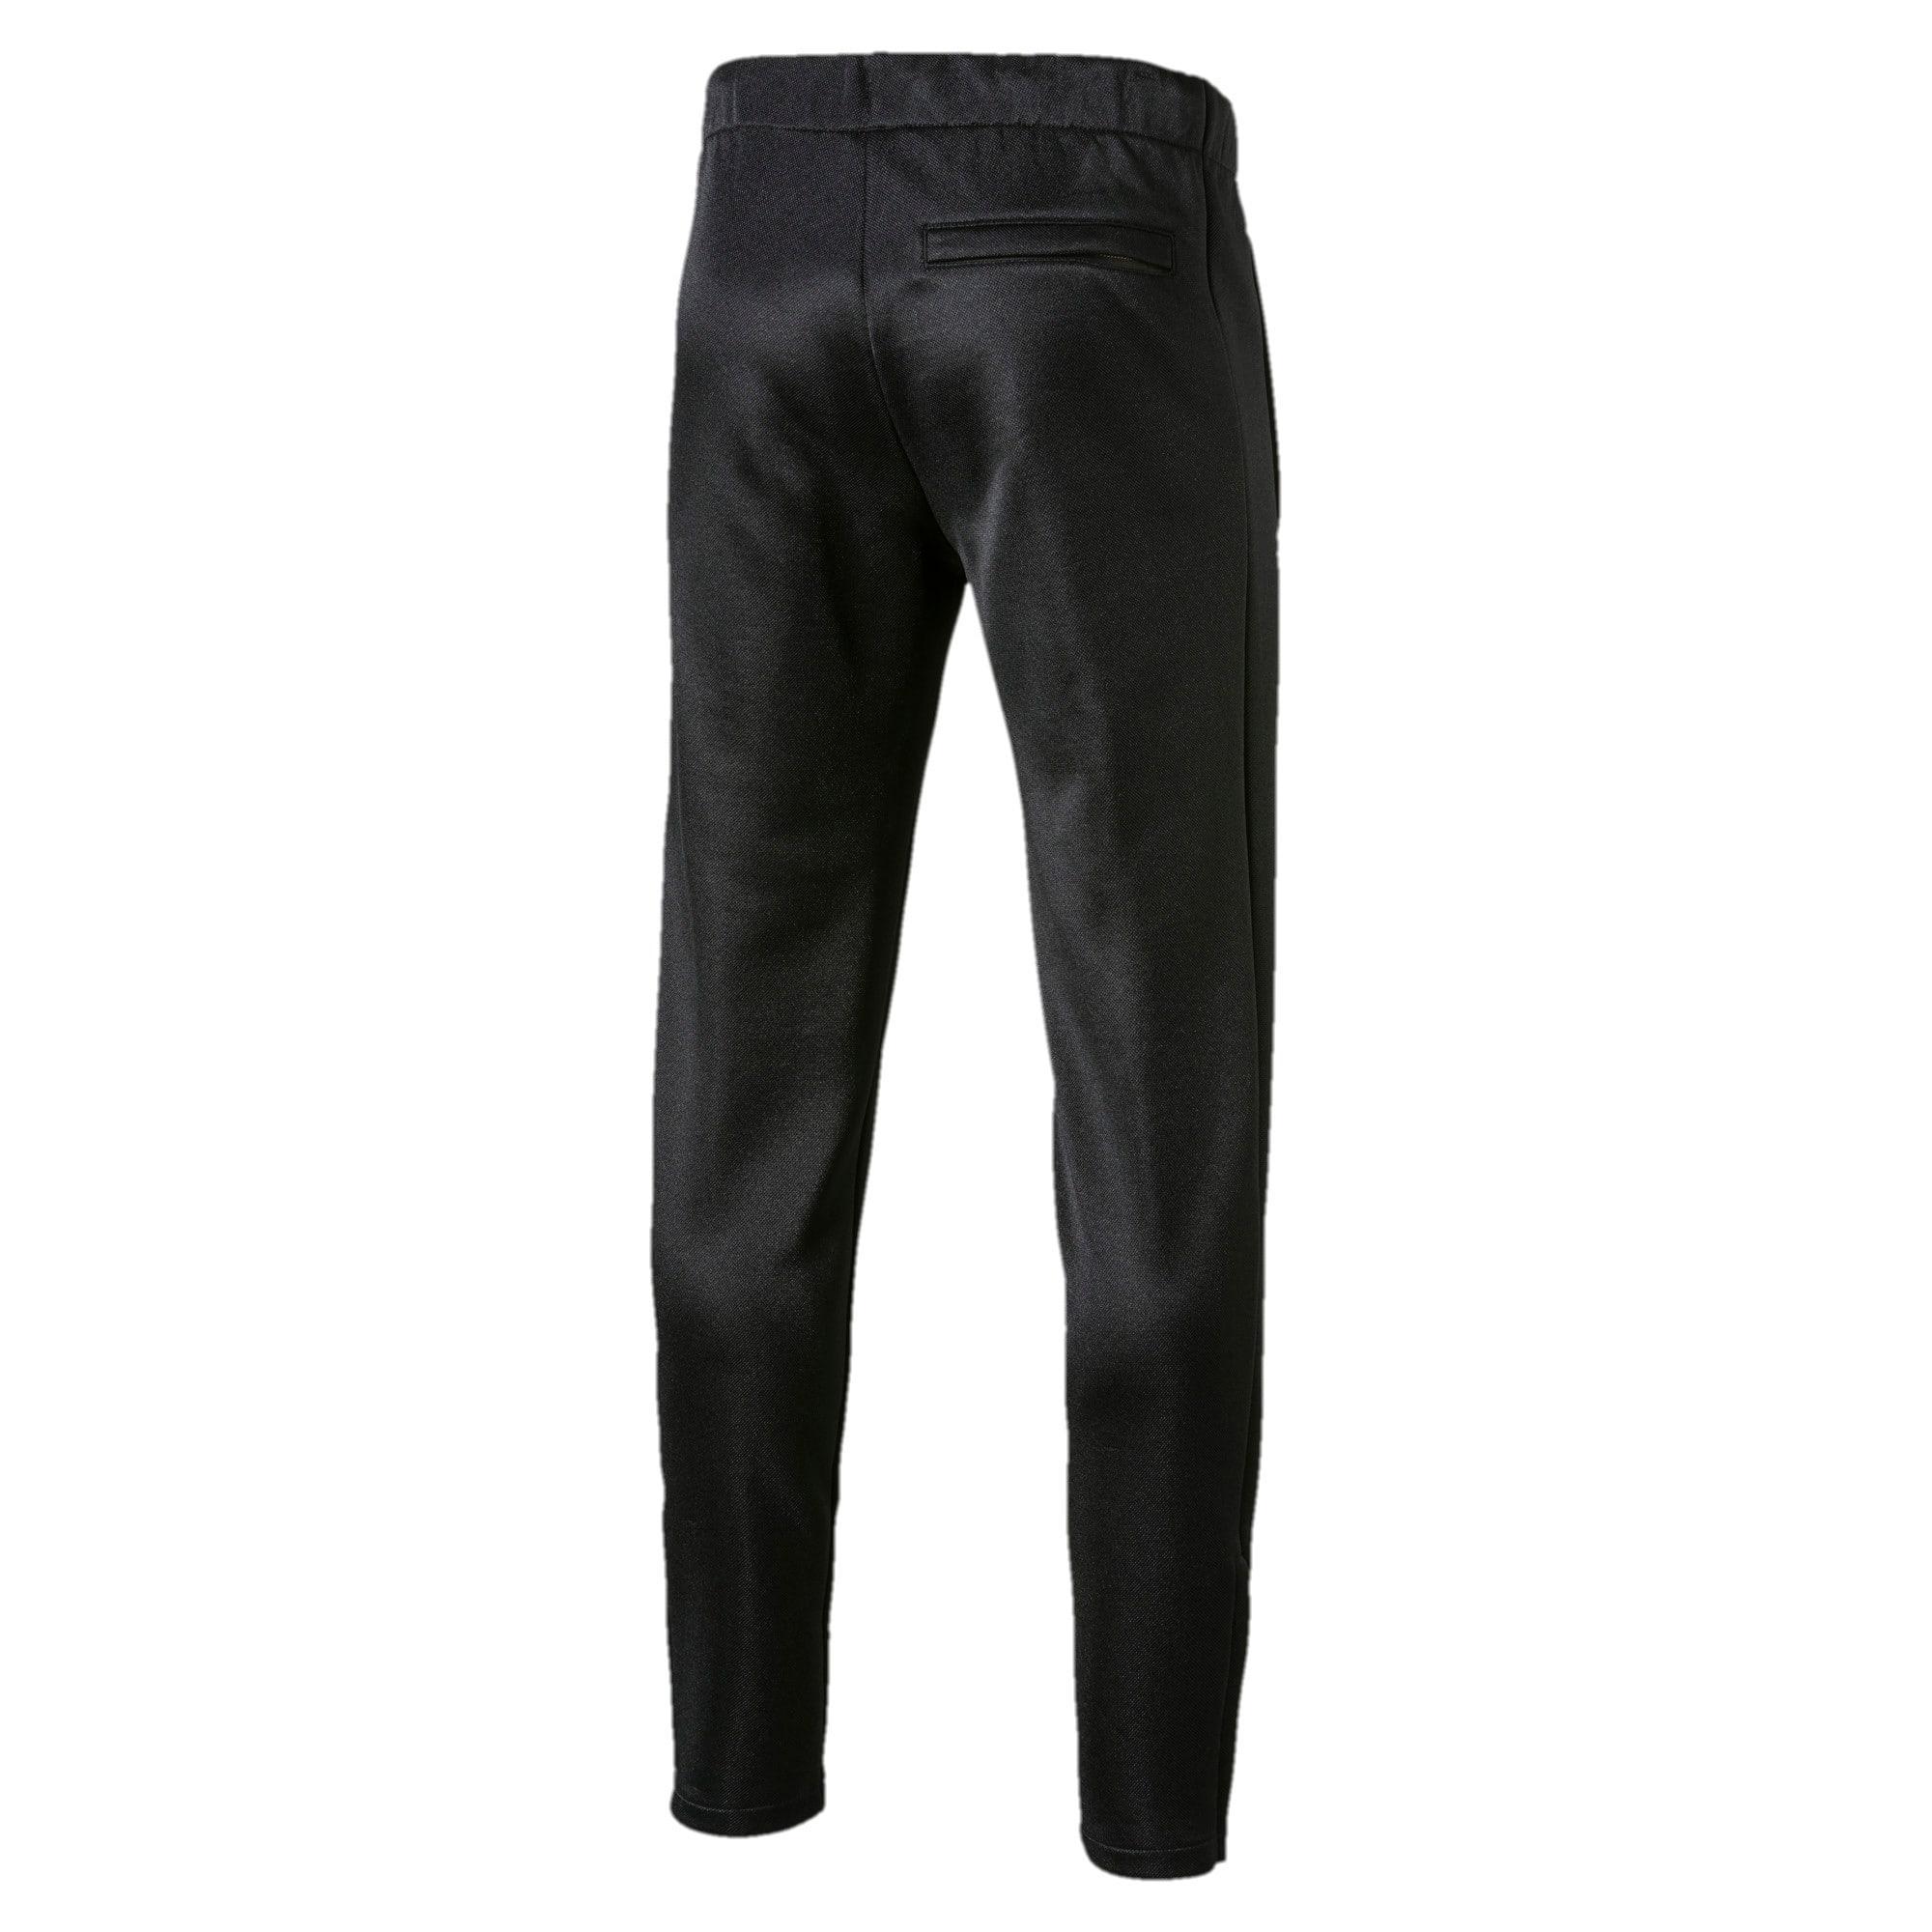 Thumbnail 5 of T7 Spezial Trophy Track Pants, Puma Black, medium-IND